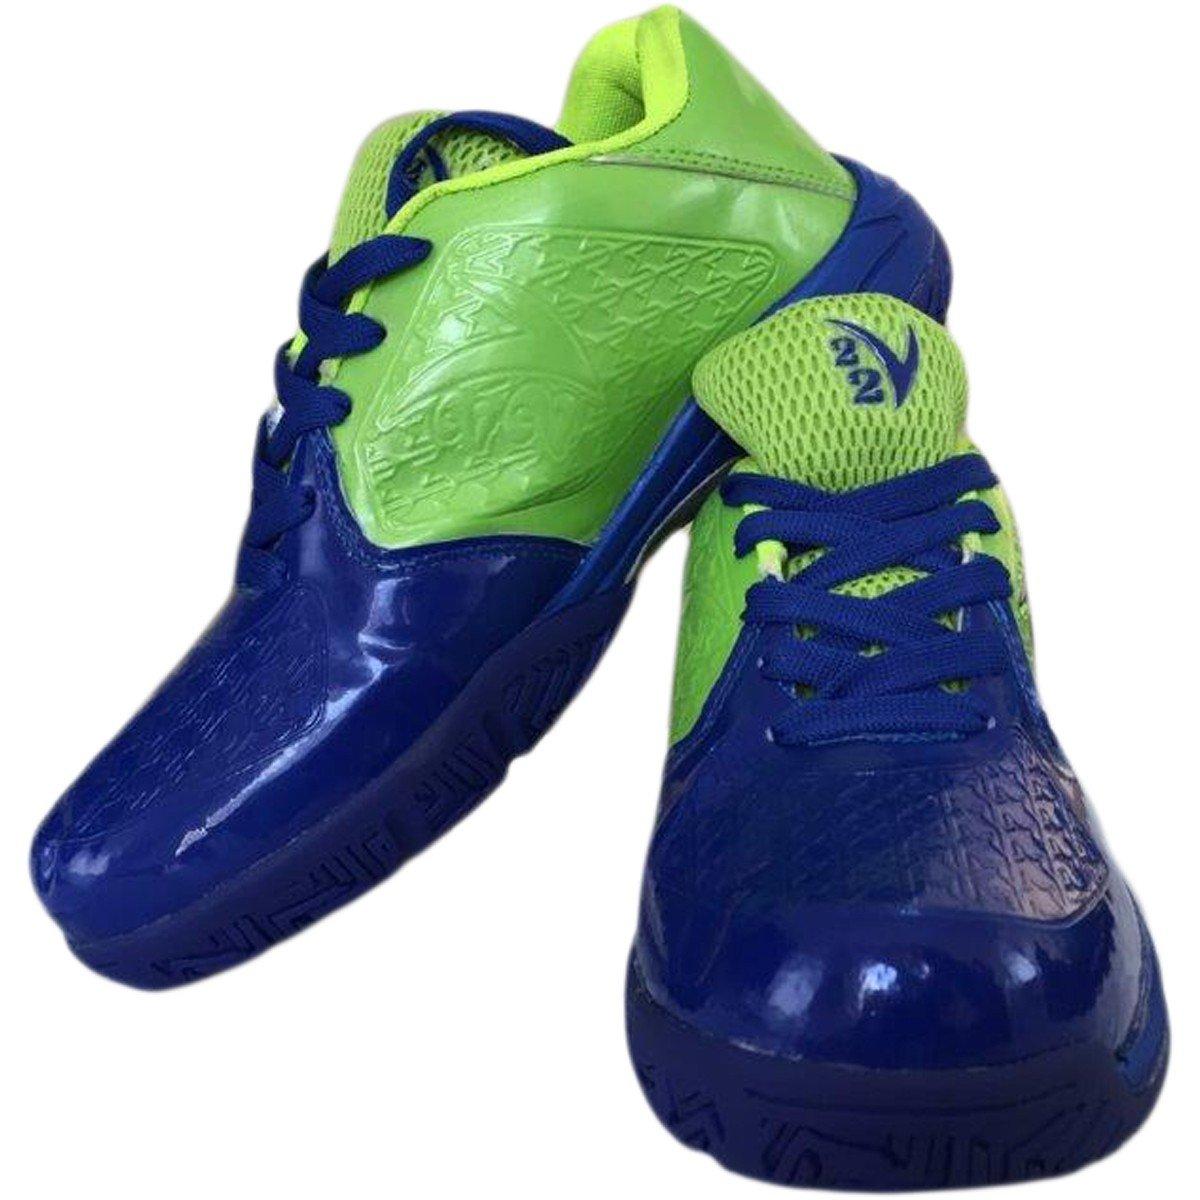 Buy V22 Champ Tennis Court Shoes - Blue